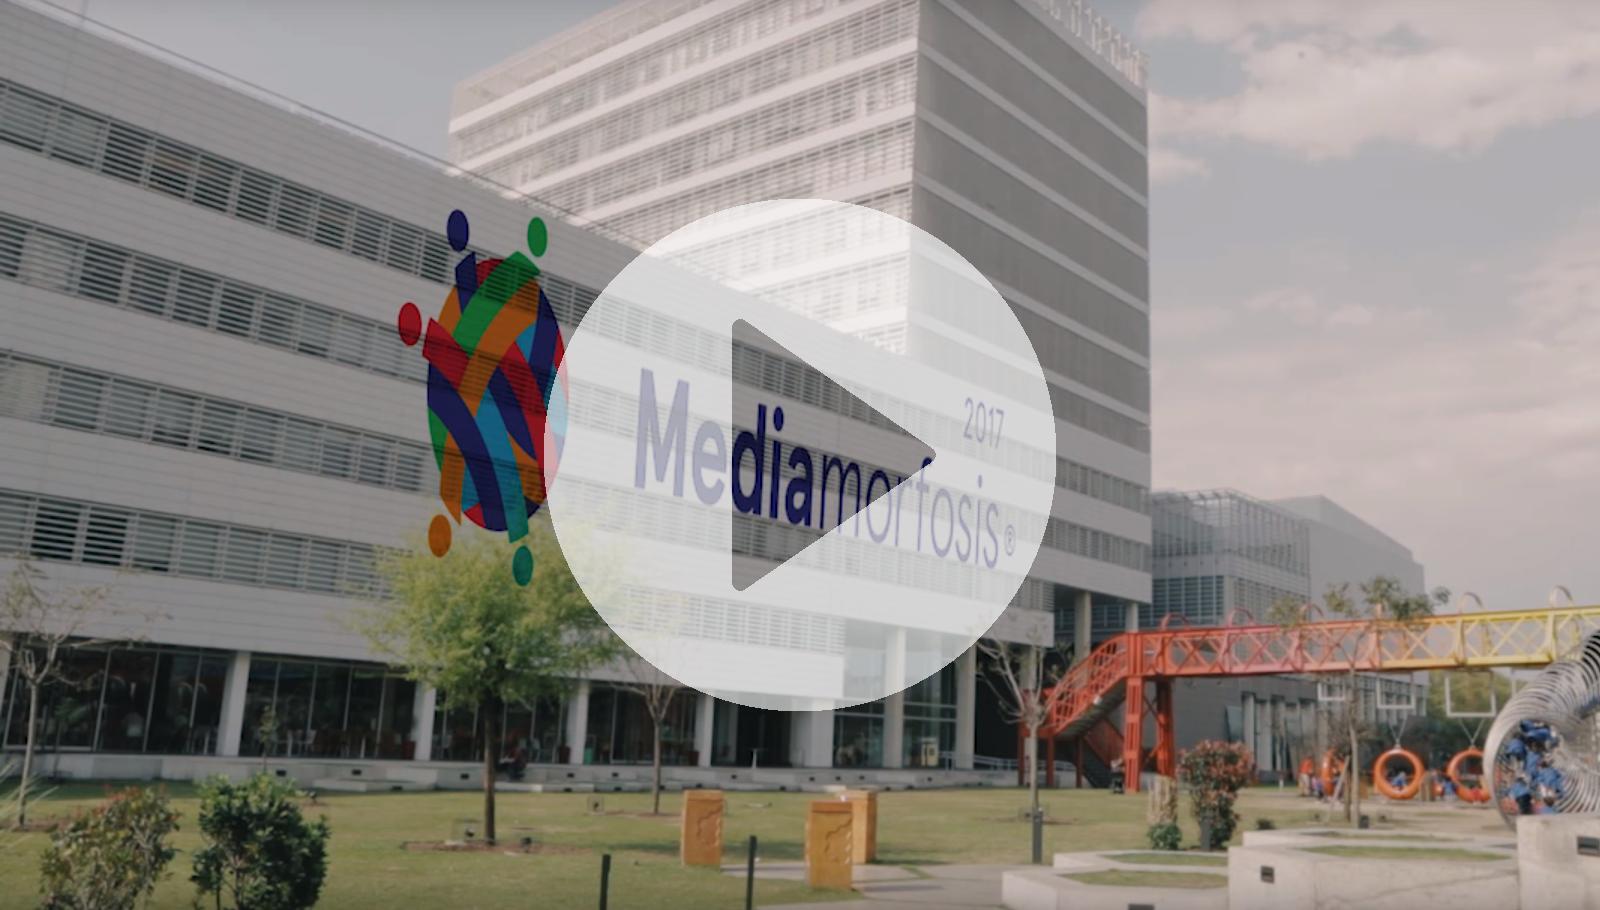 mediamorfosissplay.png